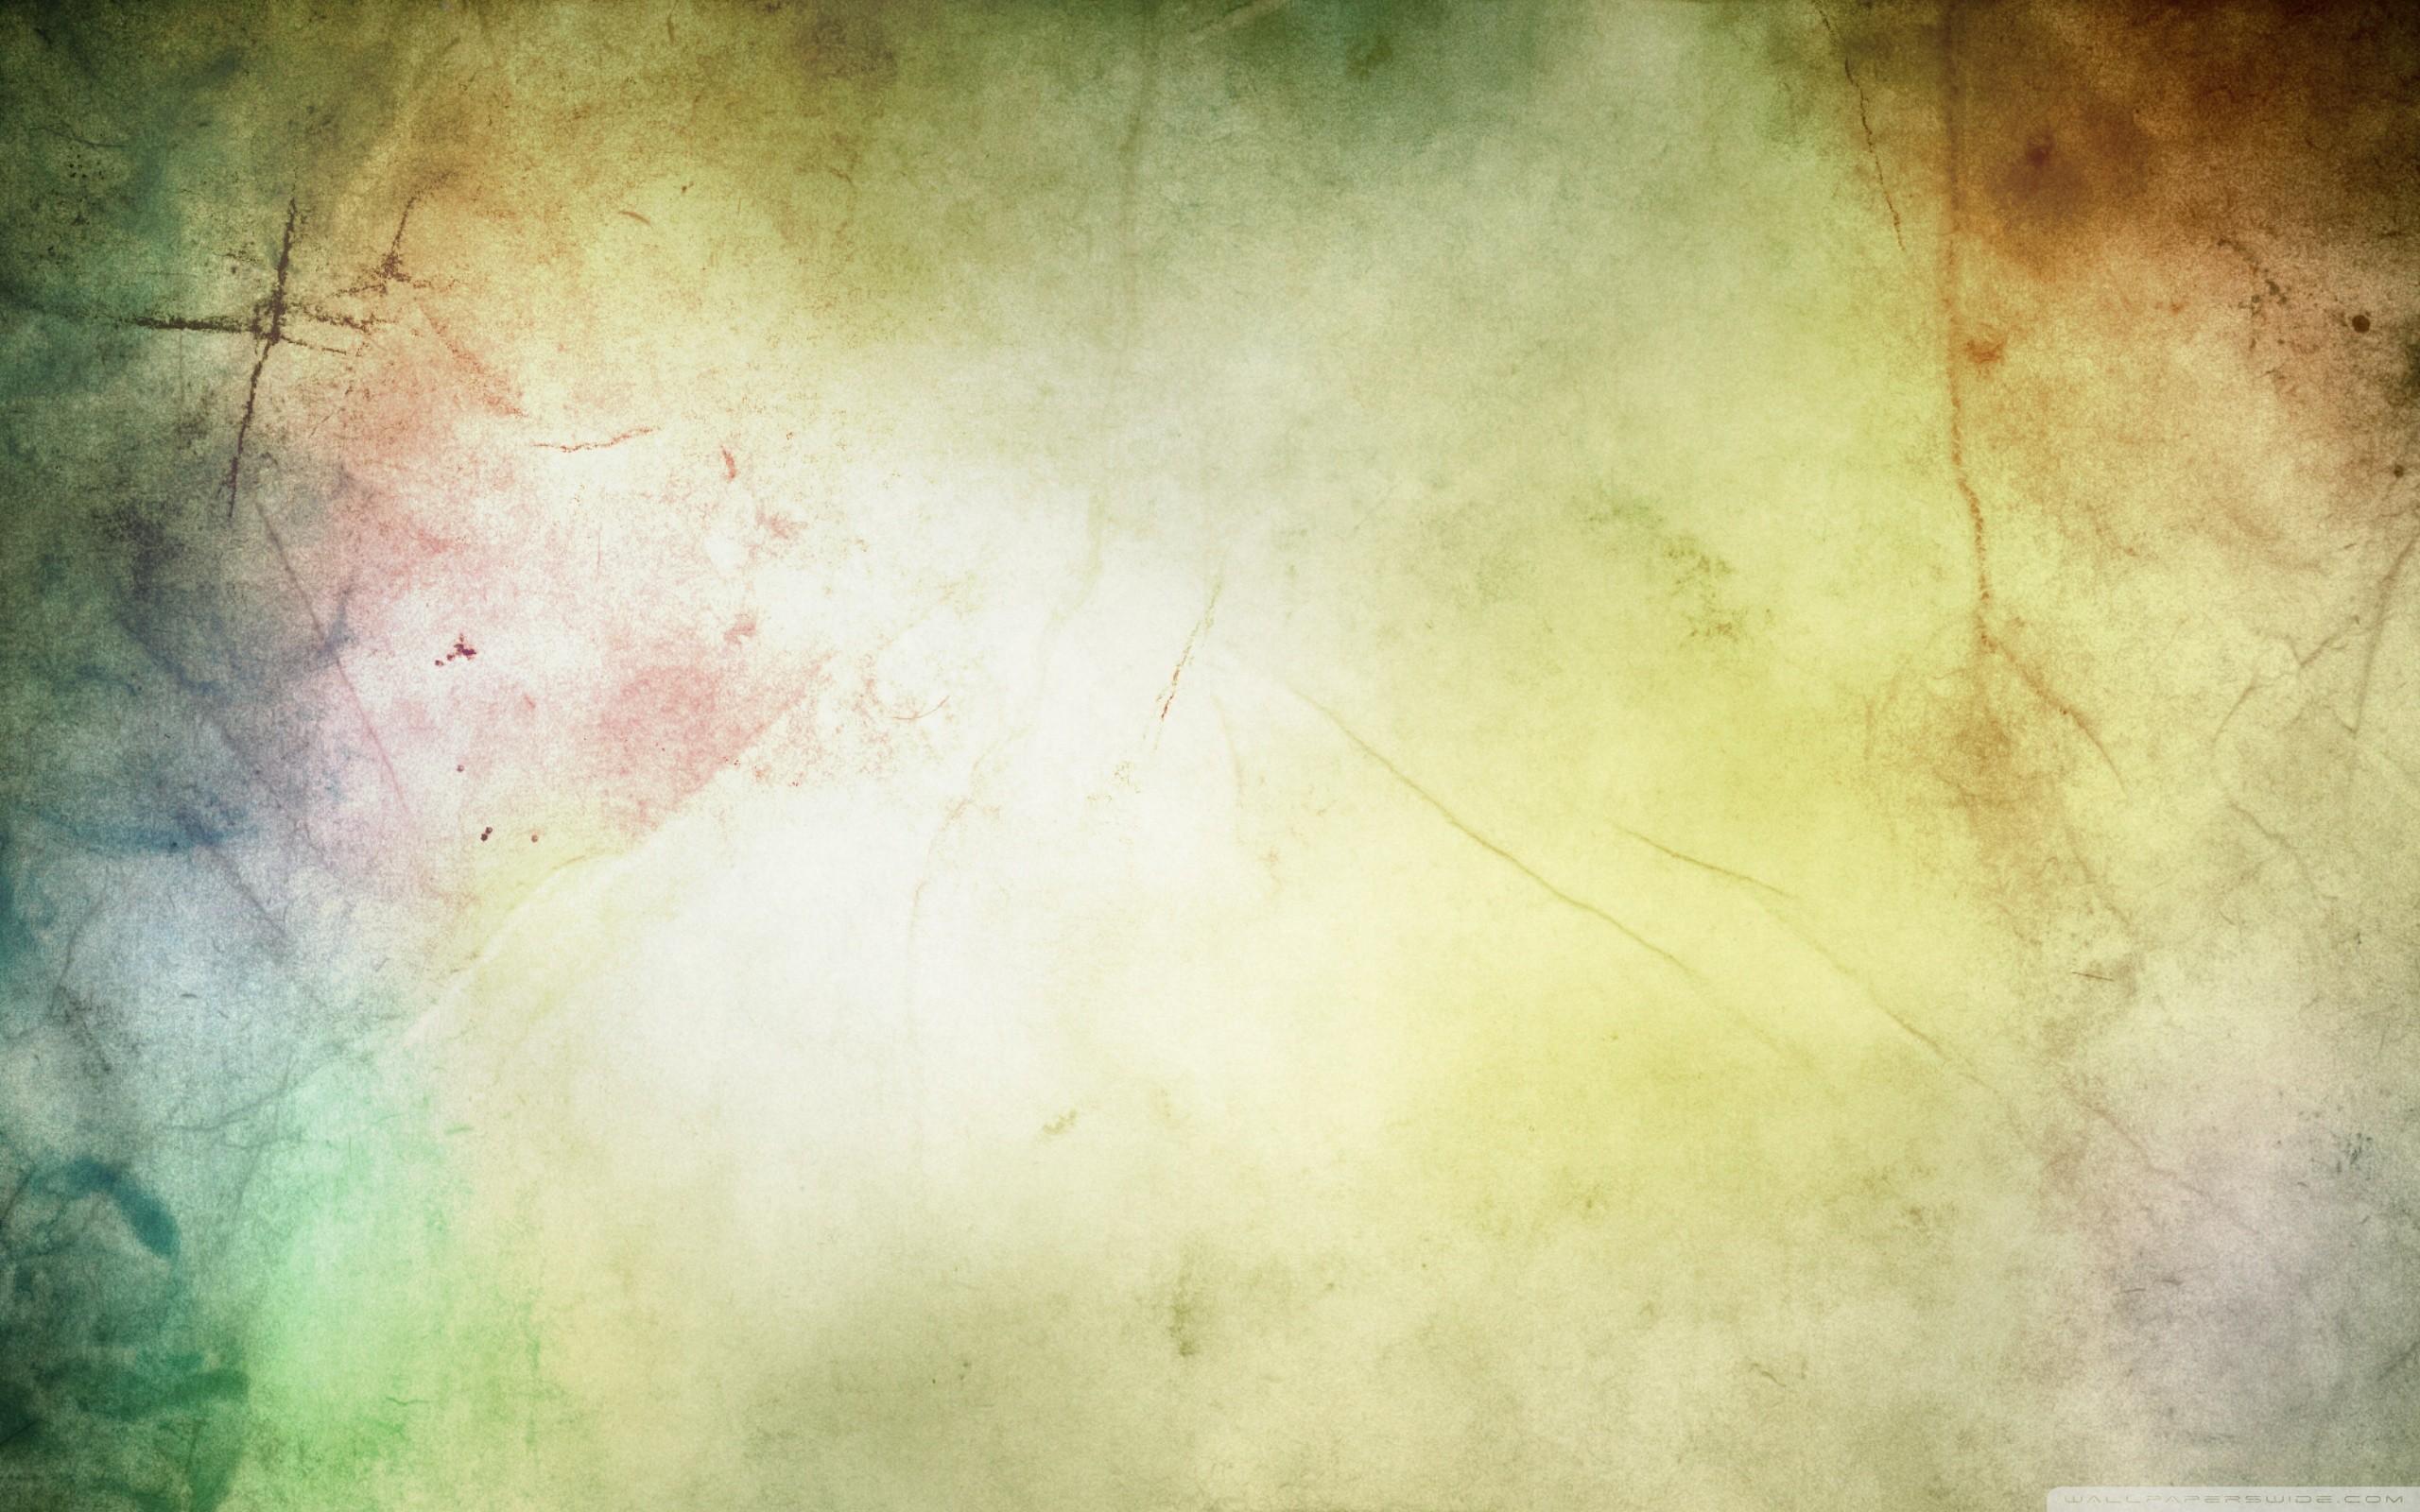 2560x1600 ... Colorful Grunge Wall Hd Desktop Wallpaper High Definition .